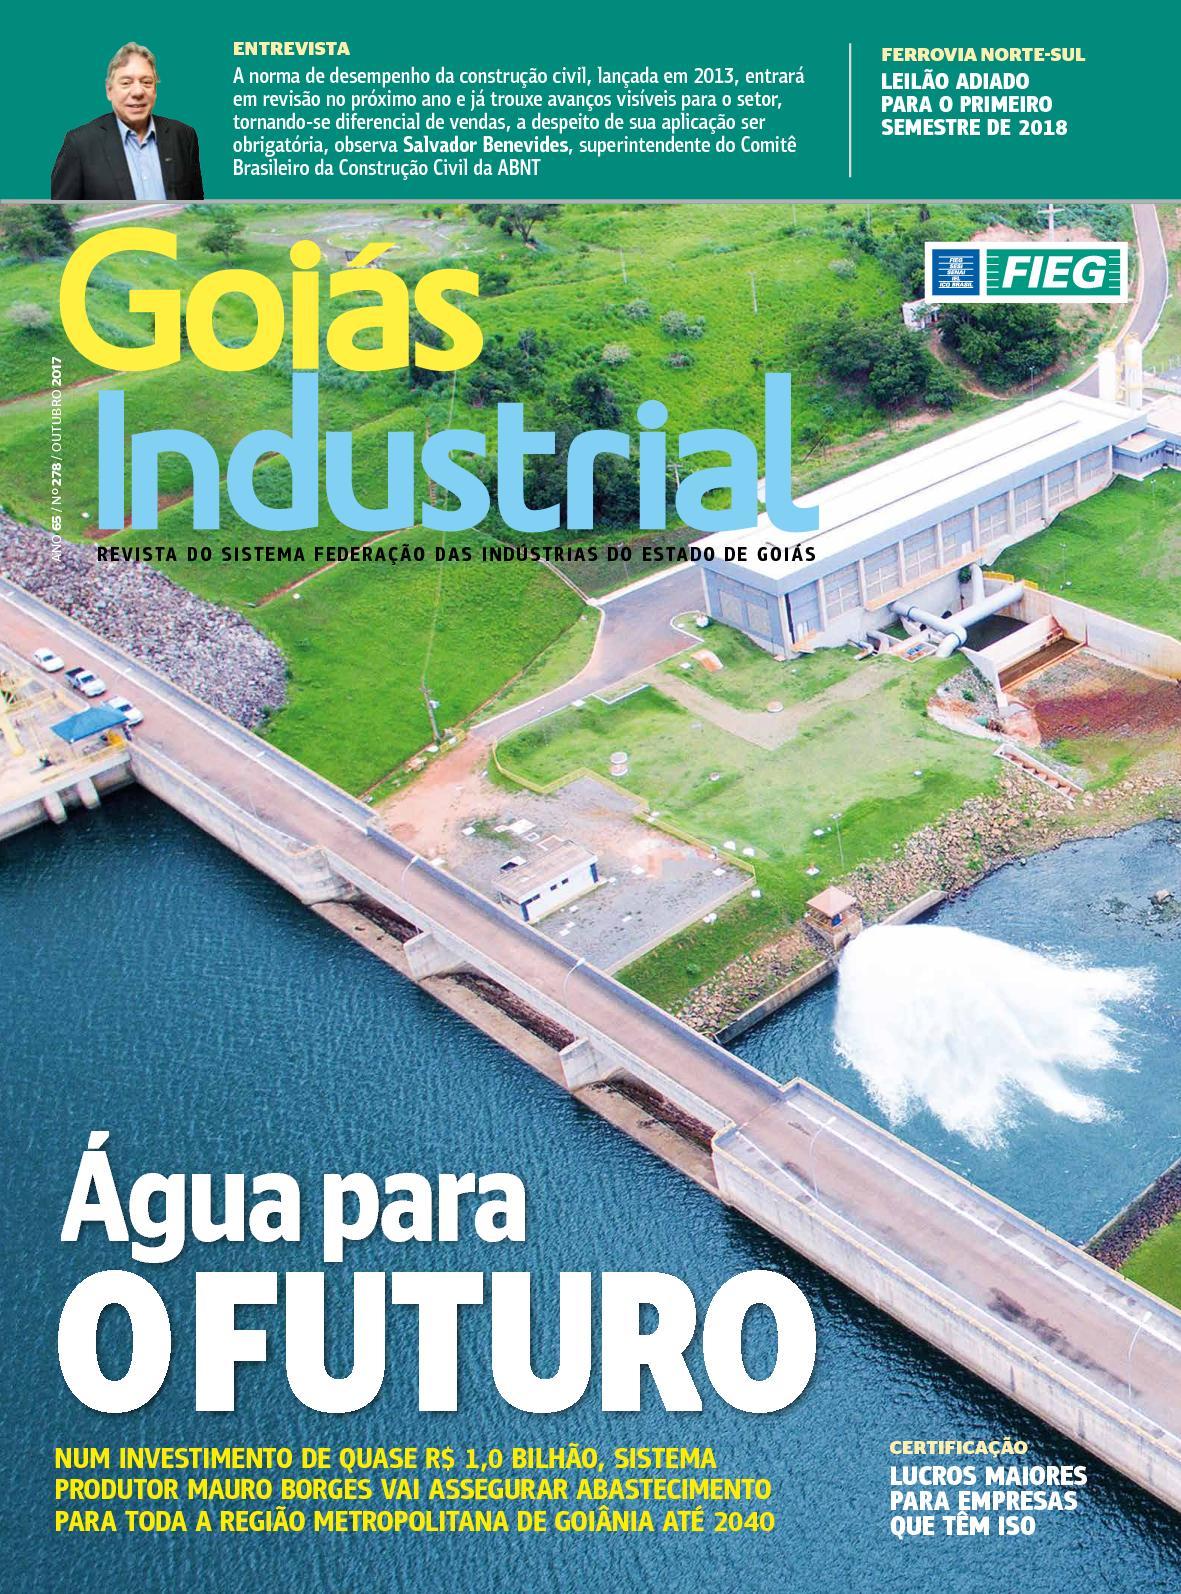 Calaméo - Revista Goias Industrial 278 Final Web 0ecf84b565